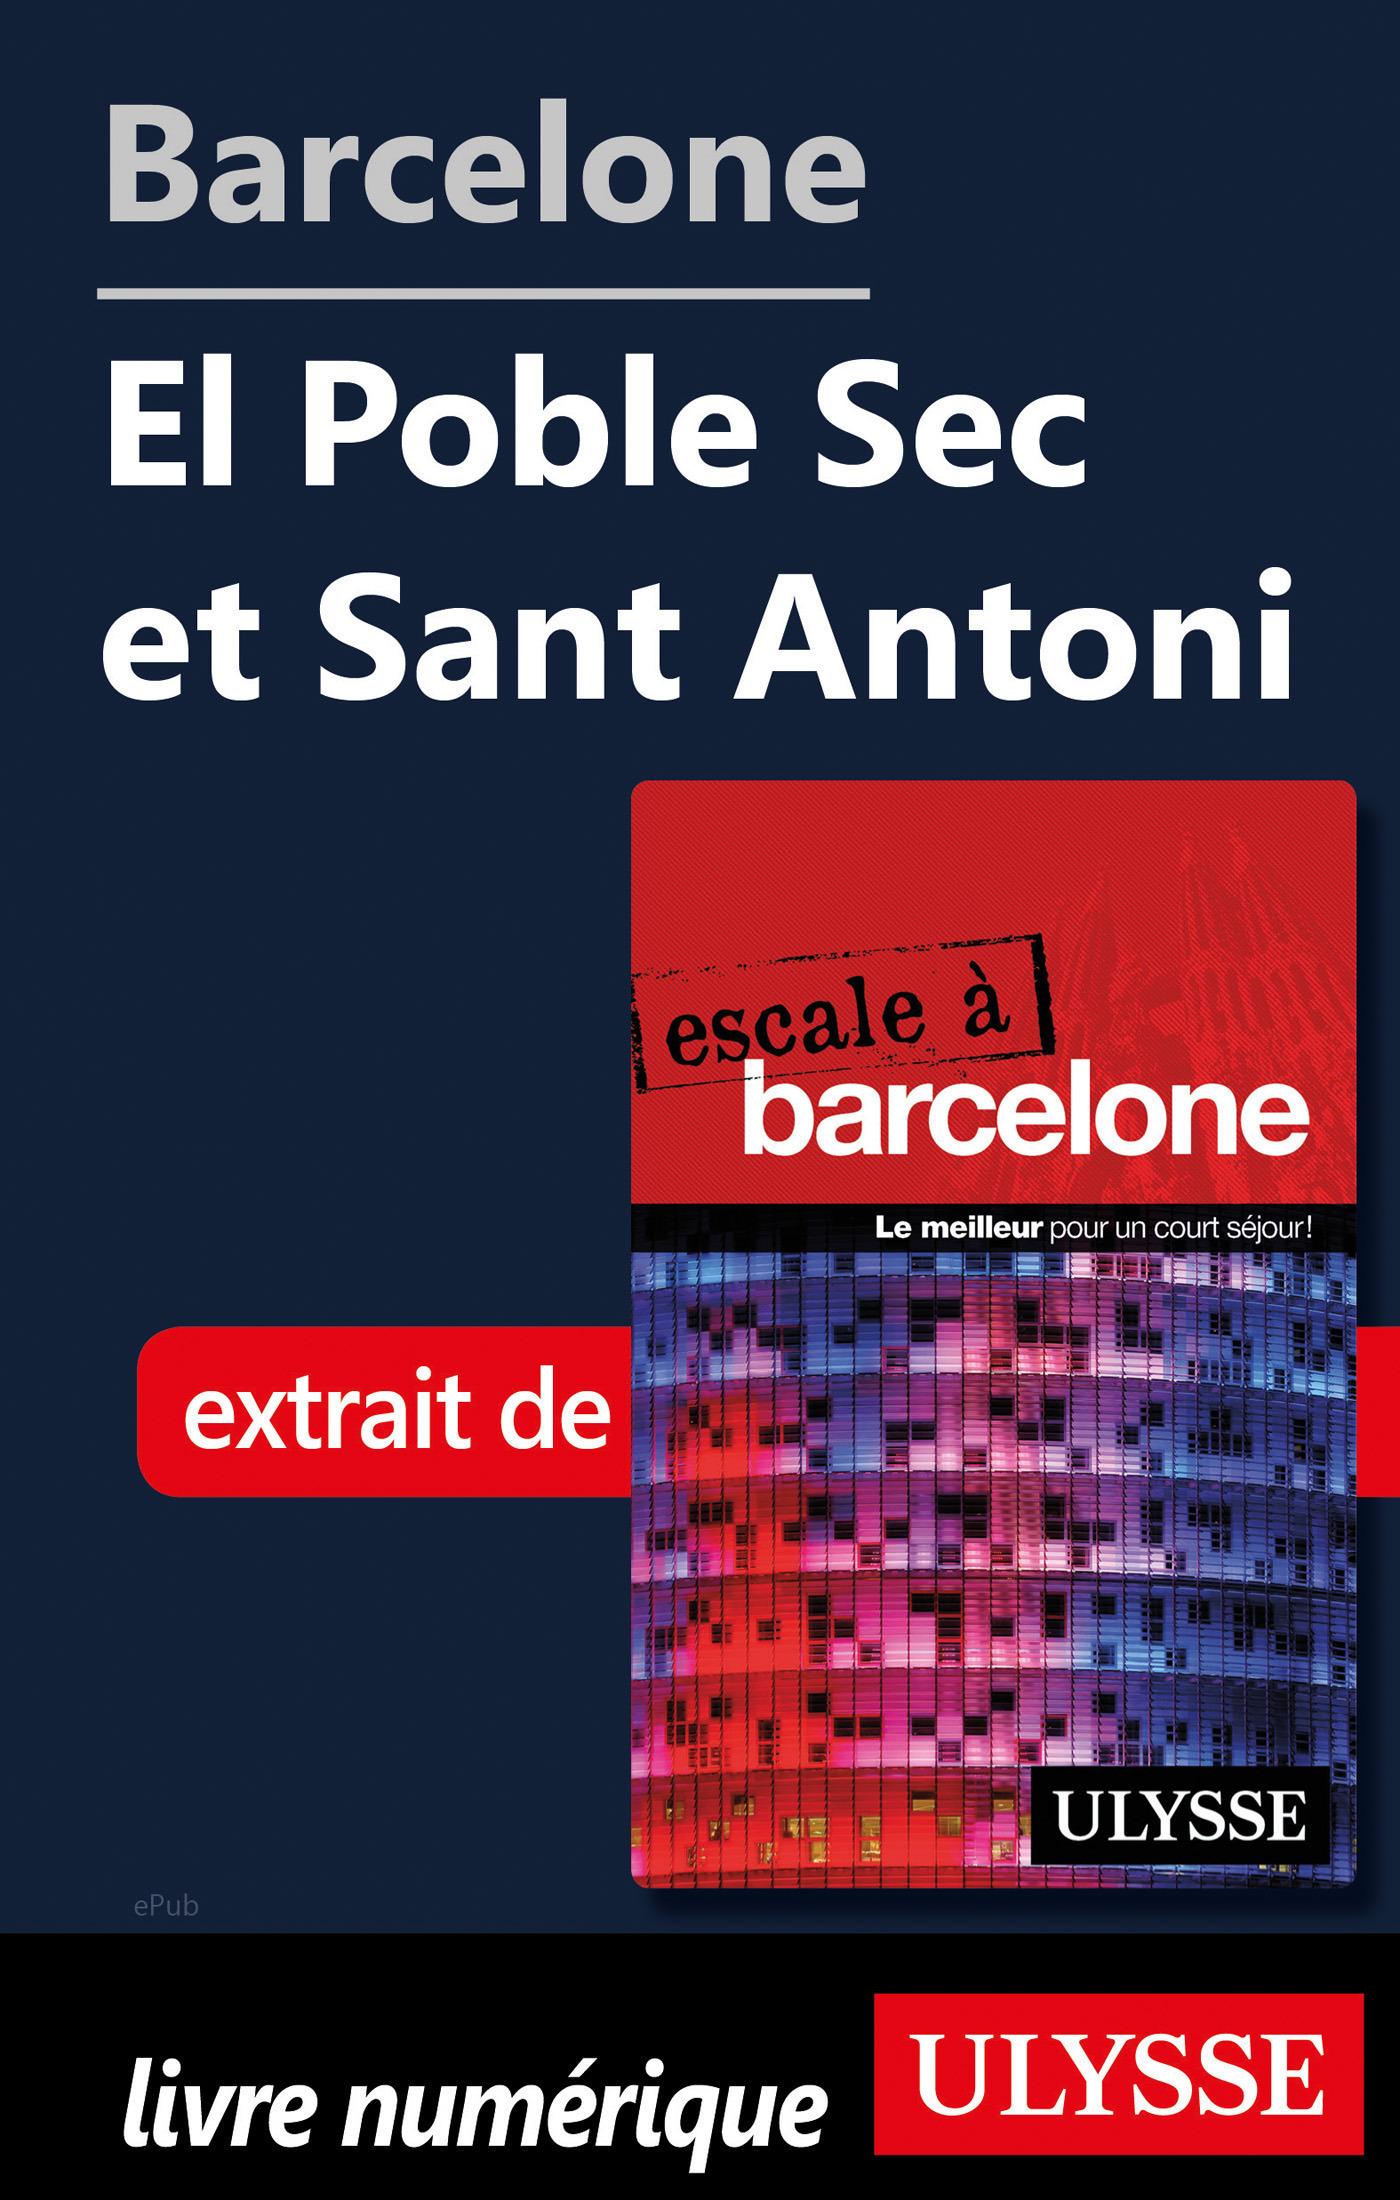 Barcelone - El Poble Sec et Sant Antoni